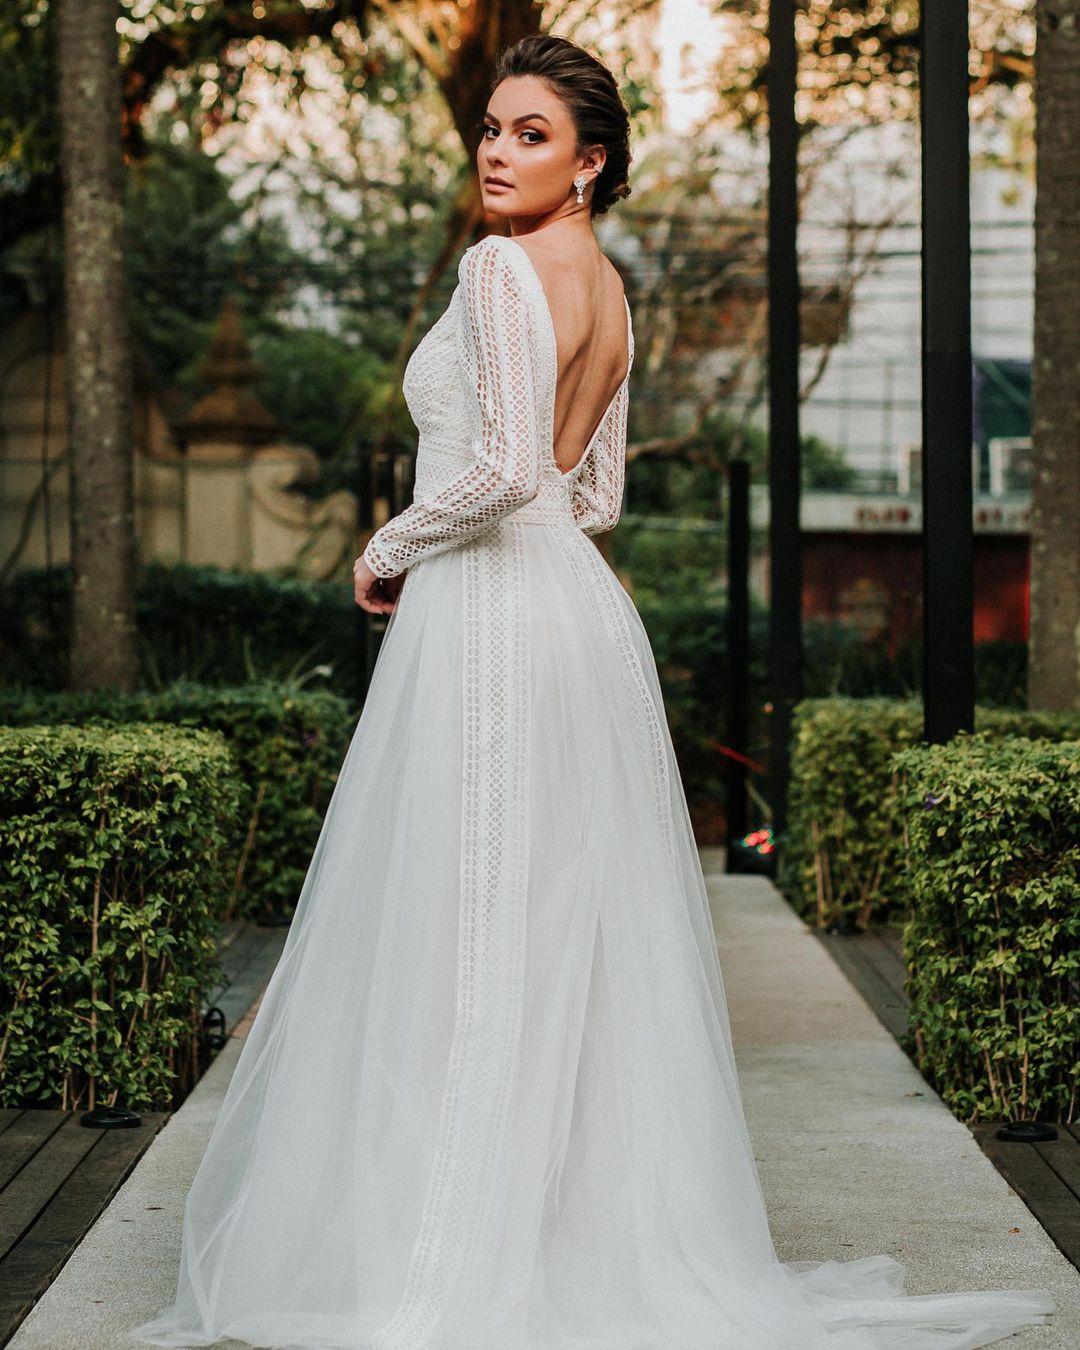 thais bonome, miss beleza da grande sao paulo 2020/miss abcd mundo 2019. 12626217